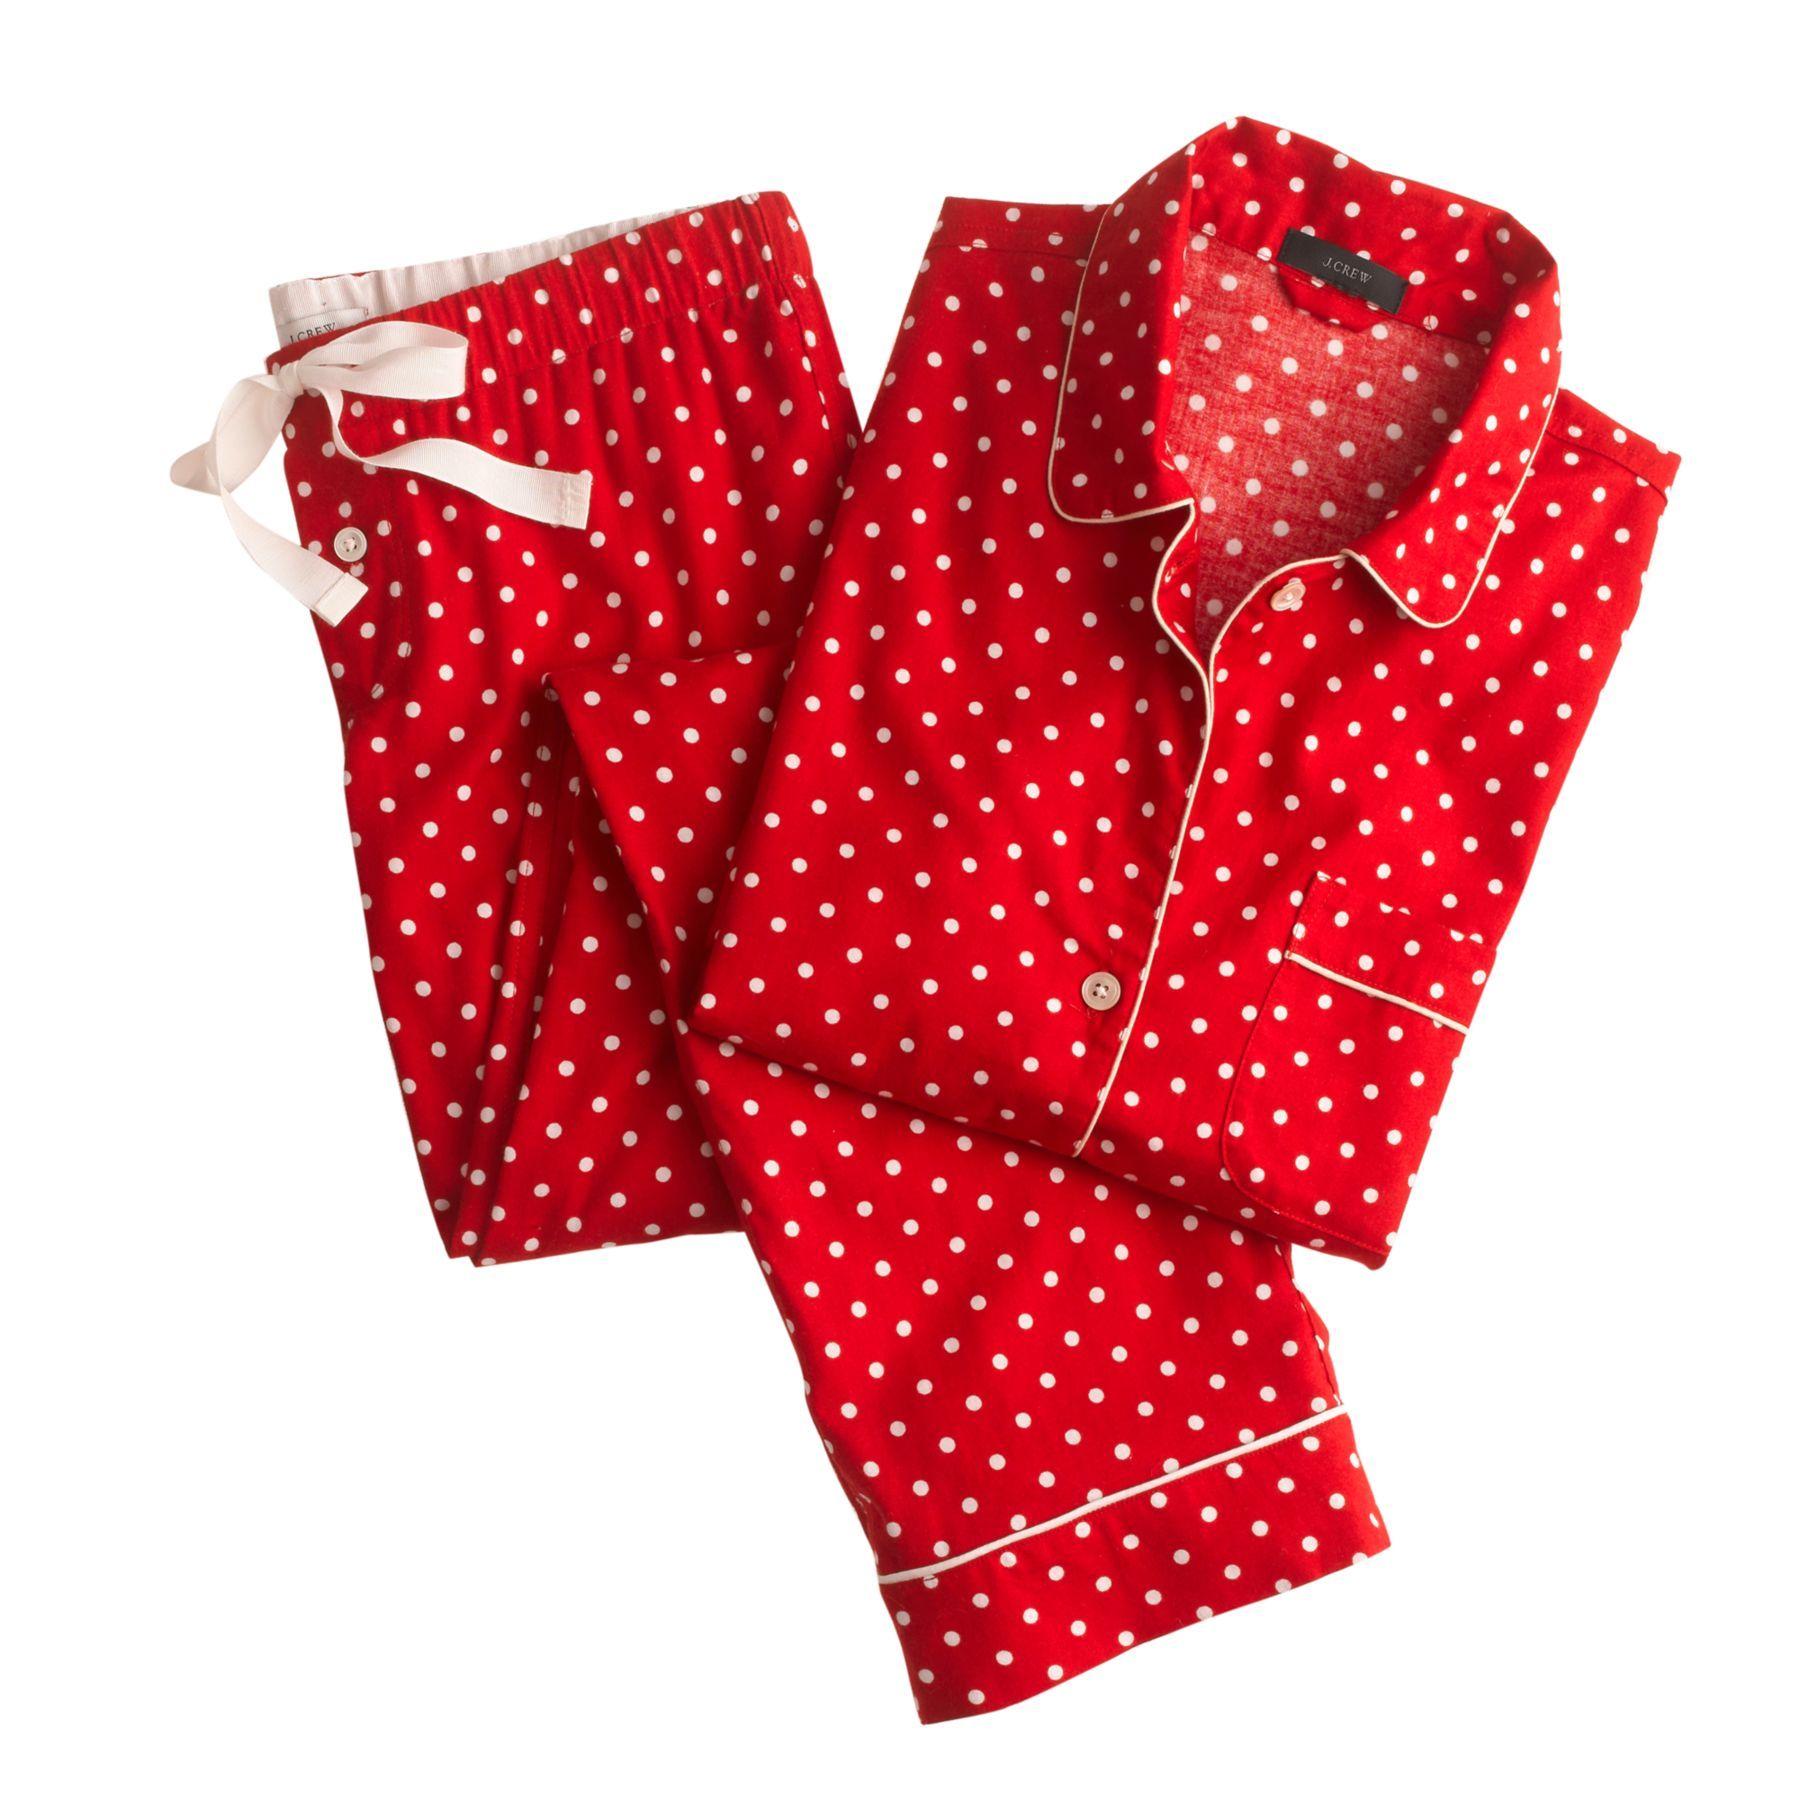 Plaid Pajama Ser // J.Crew   Gifts: The Holidays   Pinterest ...